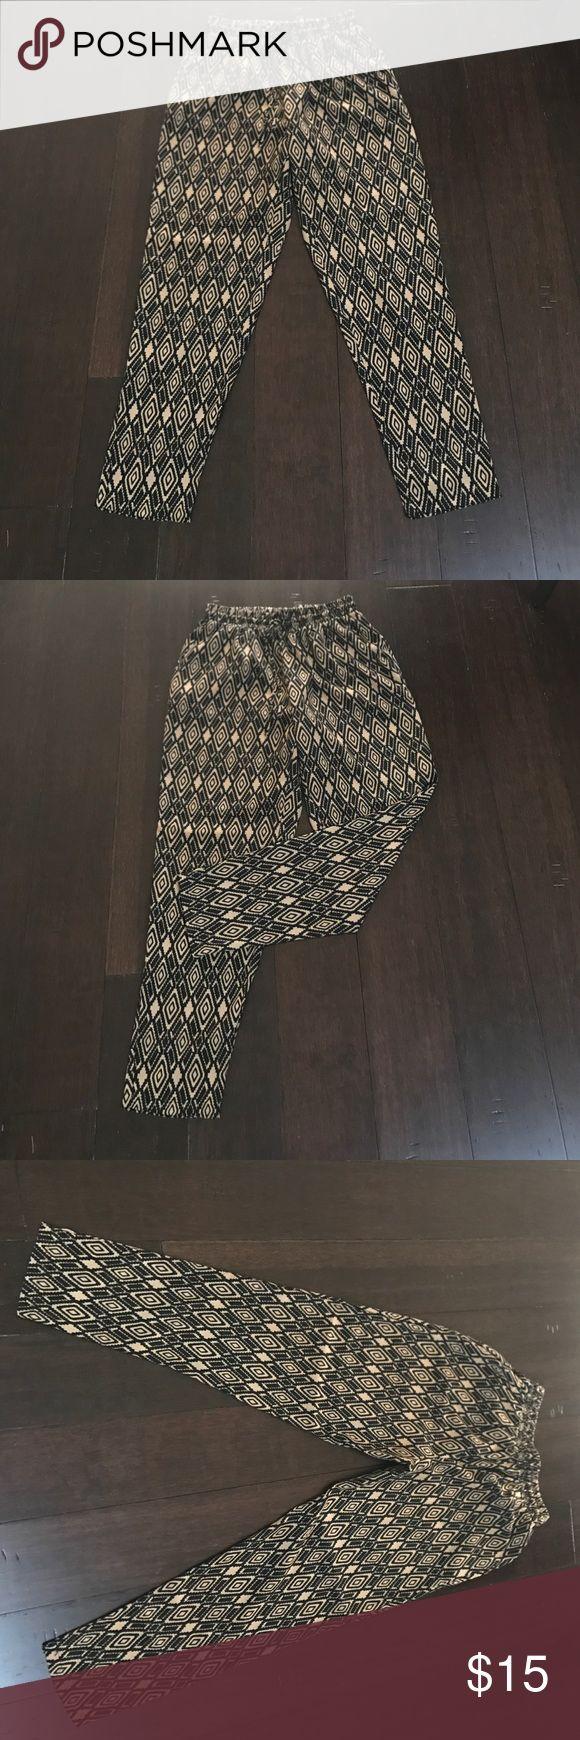 Aztec print elastic waist silk pants Forever 21 Aztec print elastic waist silk pants size M Forever 21 Pants